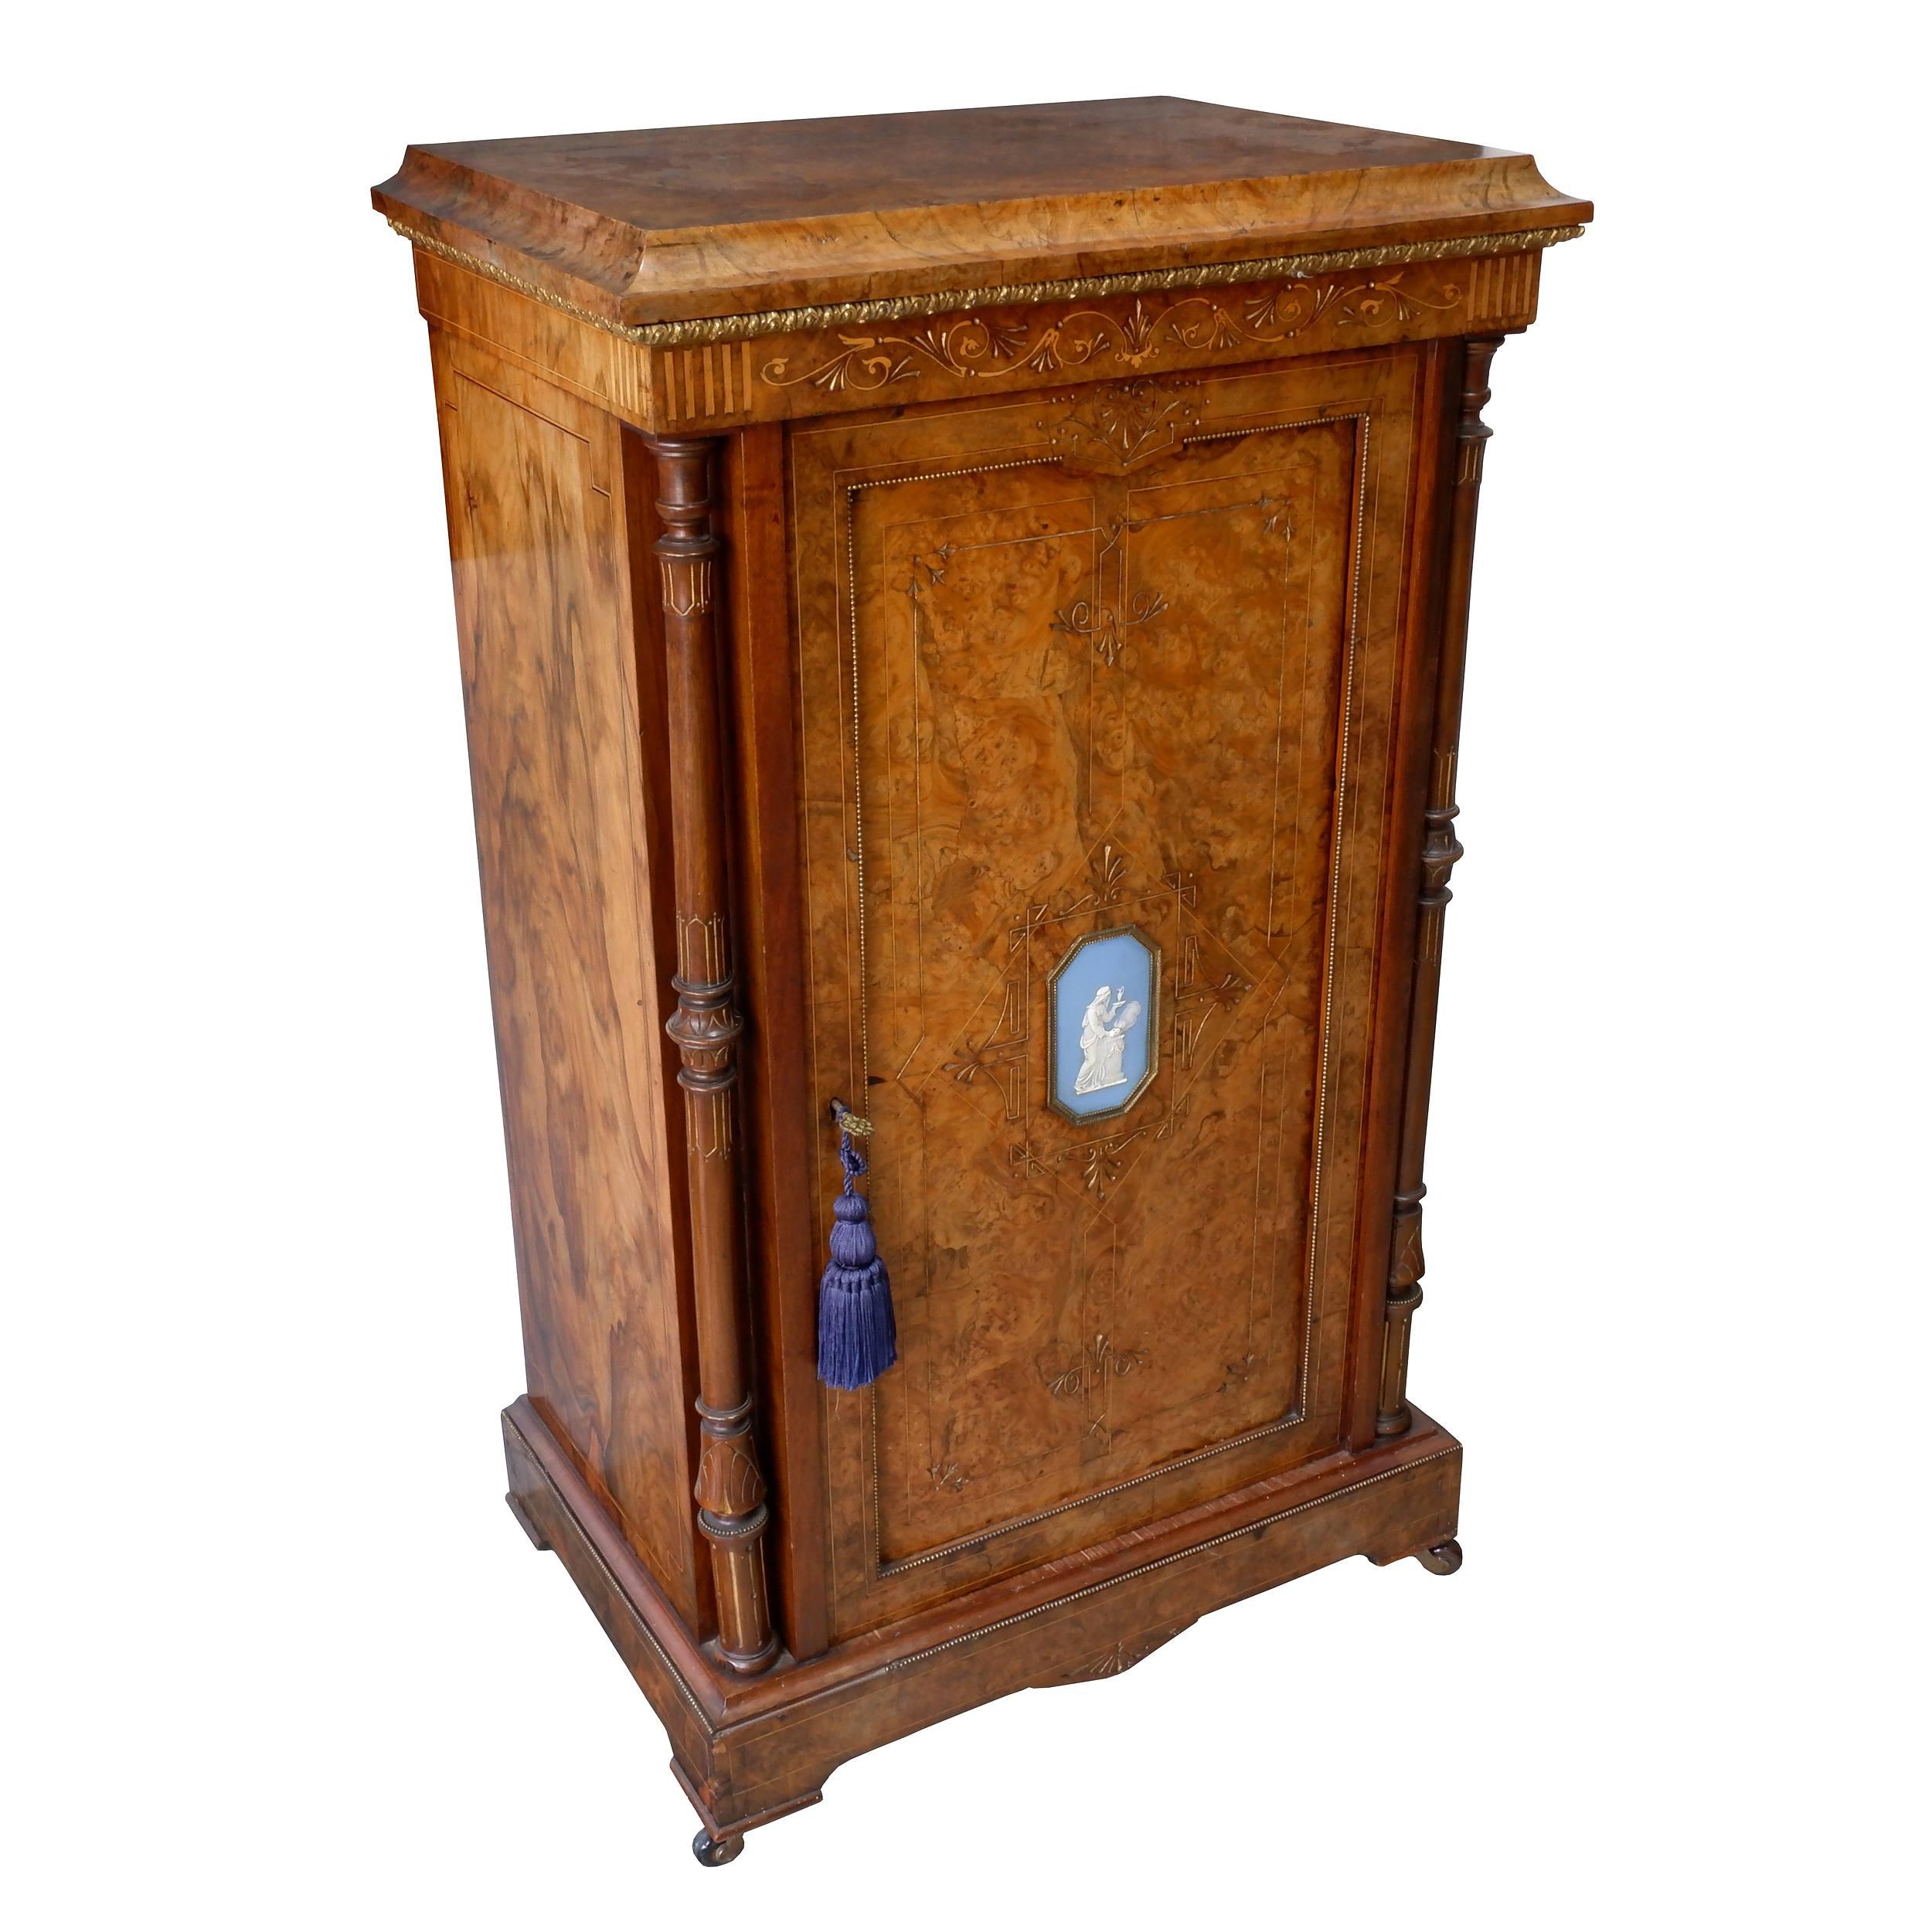 'Good Victorian String Inlaid Burr Walnut Music Cabinet with Brass Applique and Jasperware Medallion, Circa 1880'